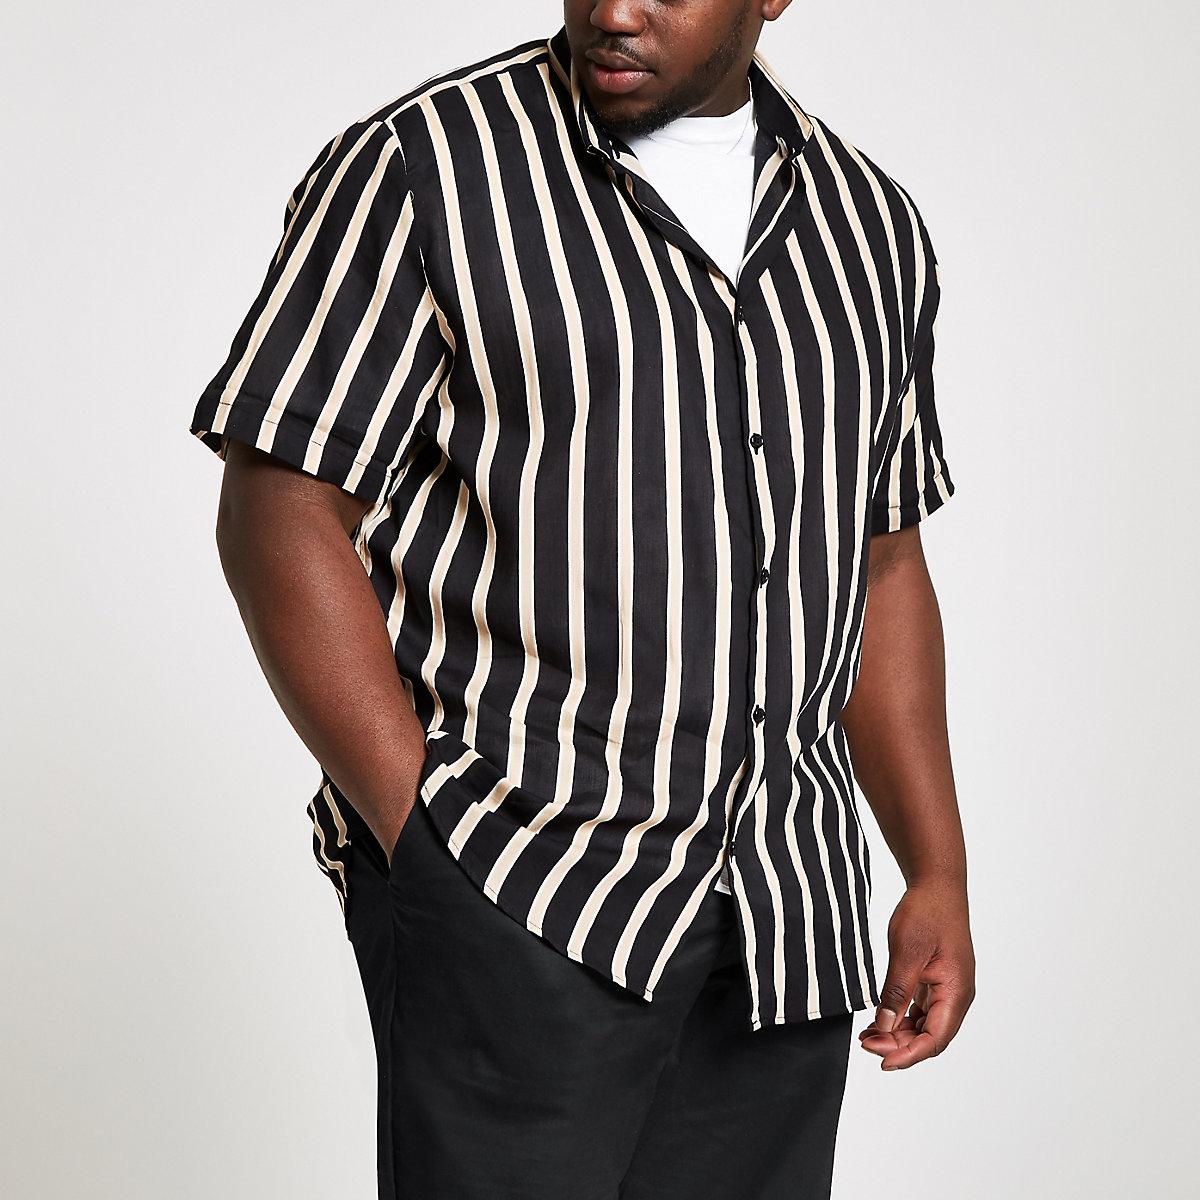 87fa0c8e76b2 Big and Tall black stripe short sleeve shirt - Short Sleeve Shirts - Shirts  - men